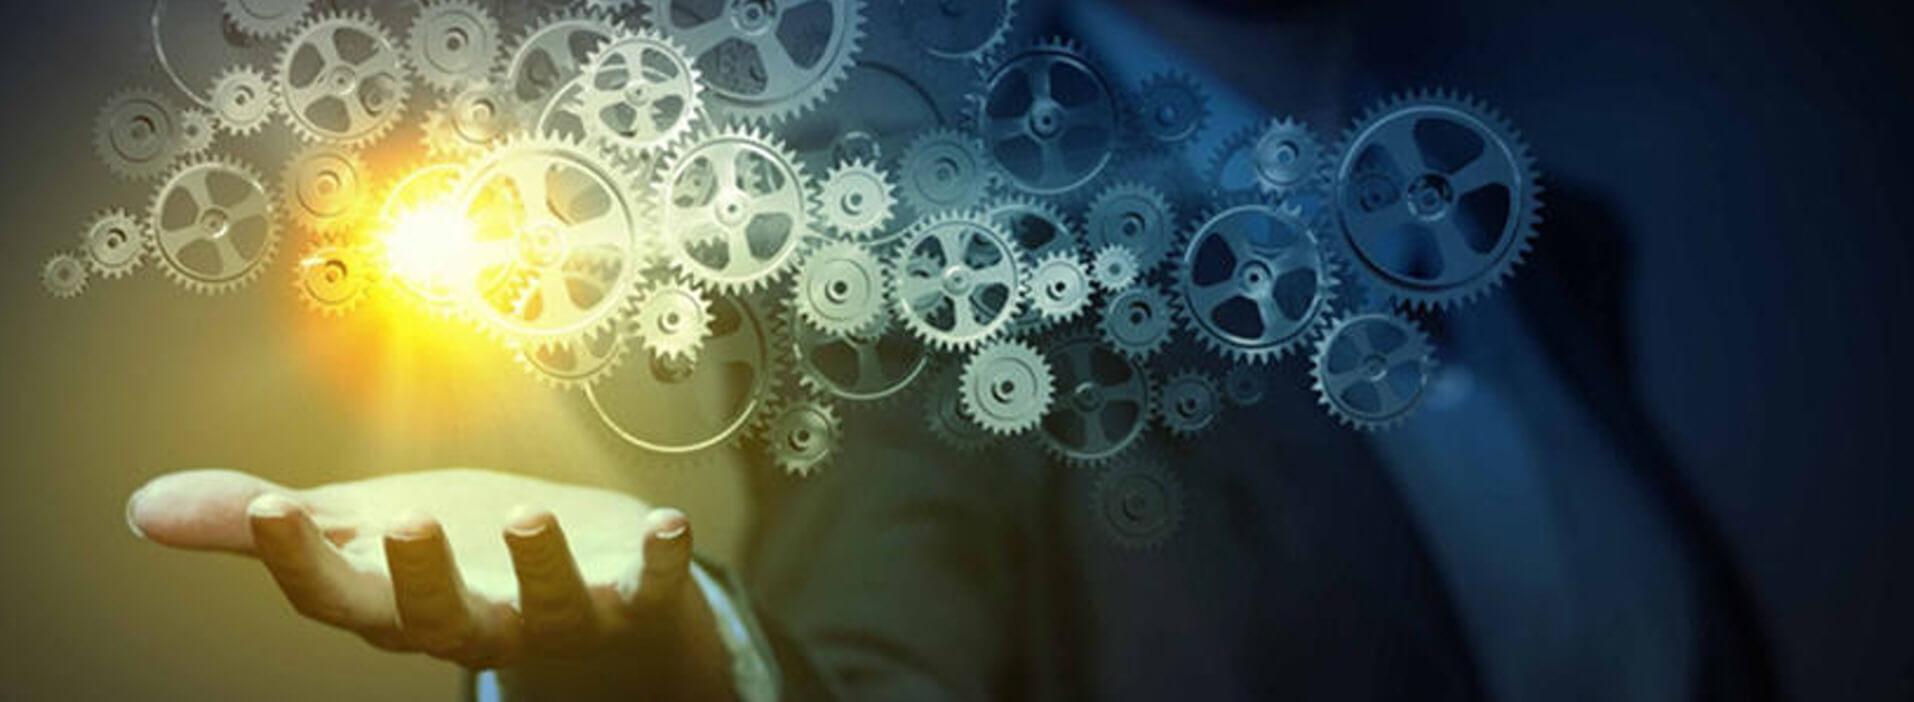 innovacion impresión digital